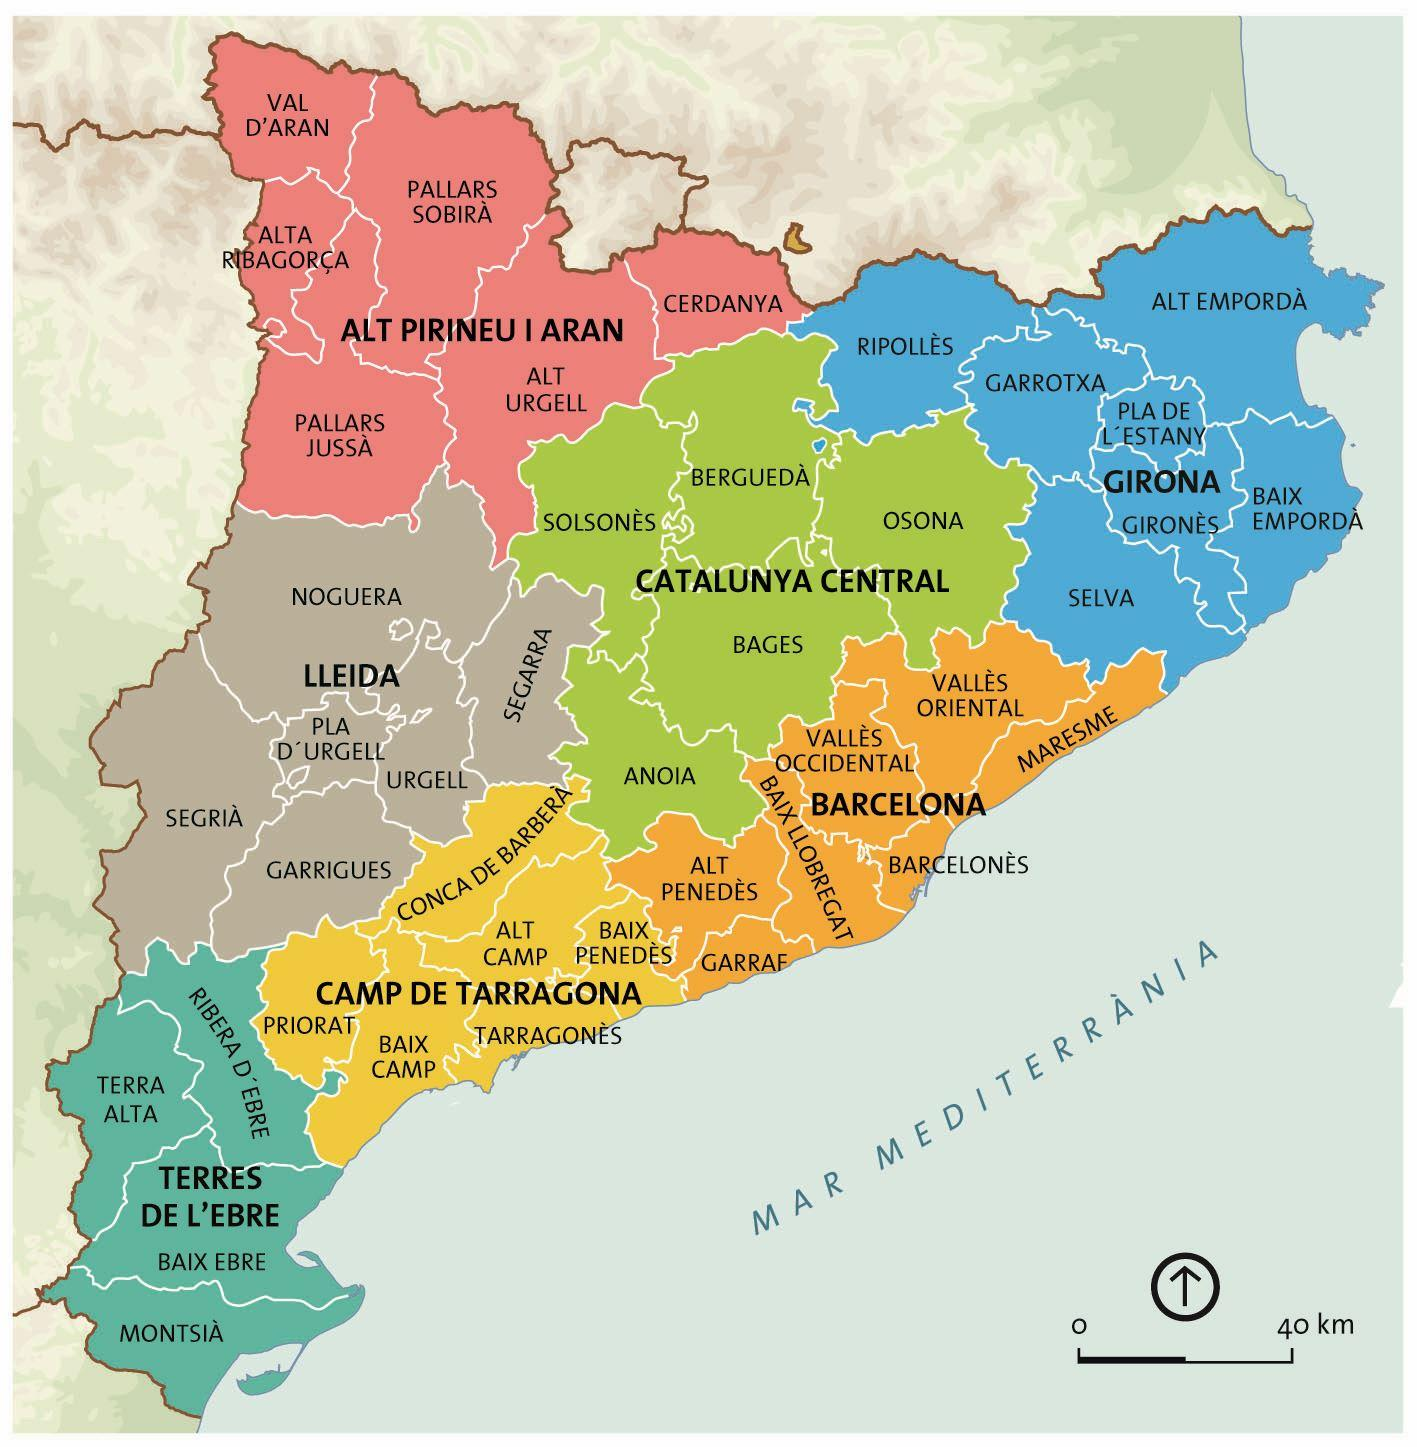 Cartina Catalogna.Catalunya Di Barcellona Mappa Mappa Di Catalunya Di Barcellona Catalogna Spagna